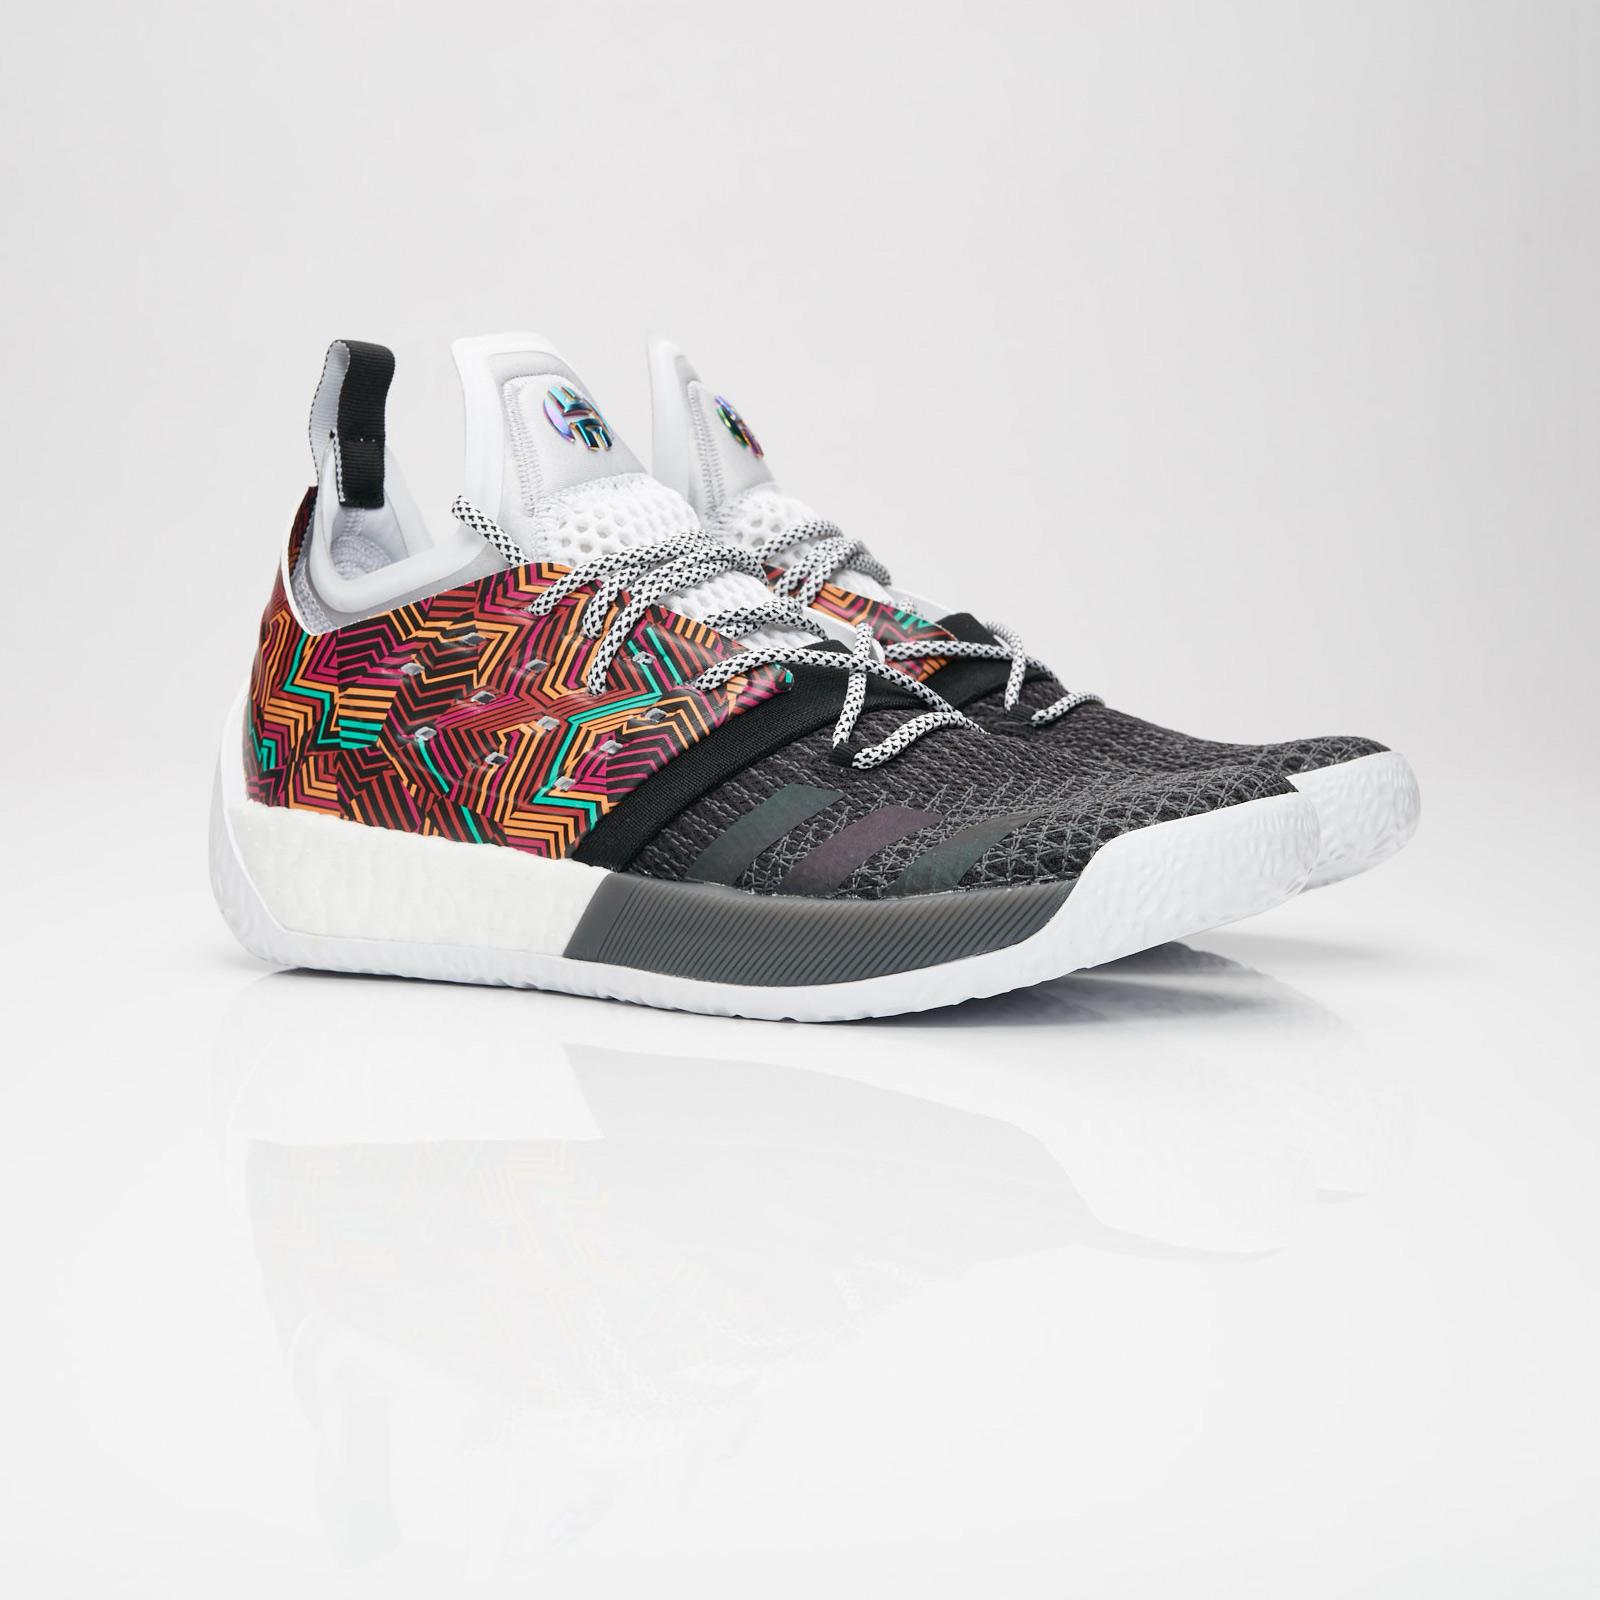 cf1e8391451 adidas Harden Vol. 2 - Aq0048 - Sneakersnstuff